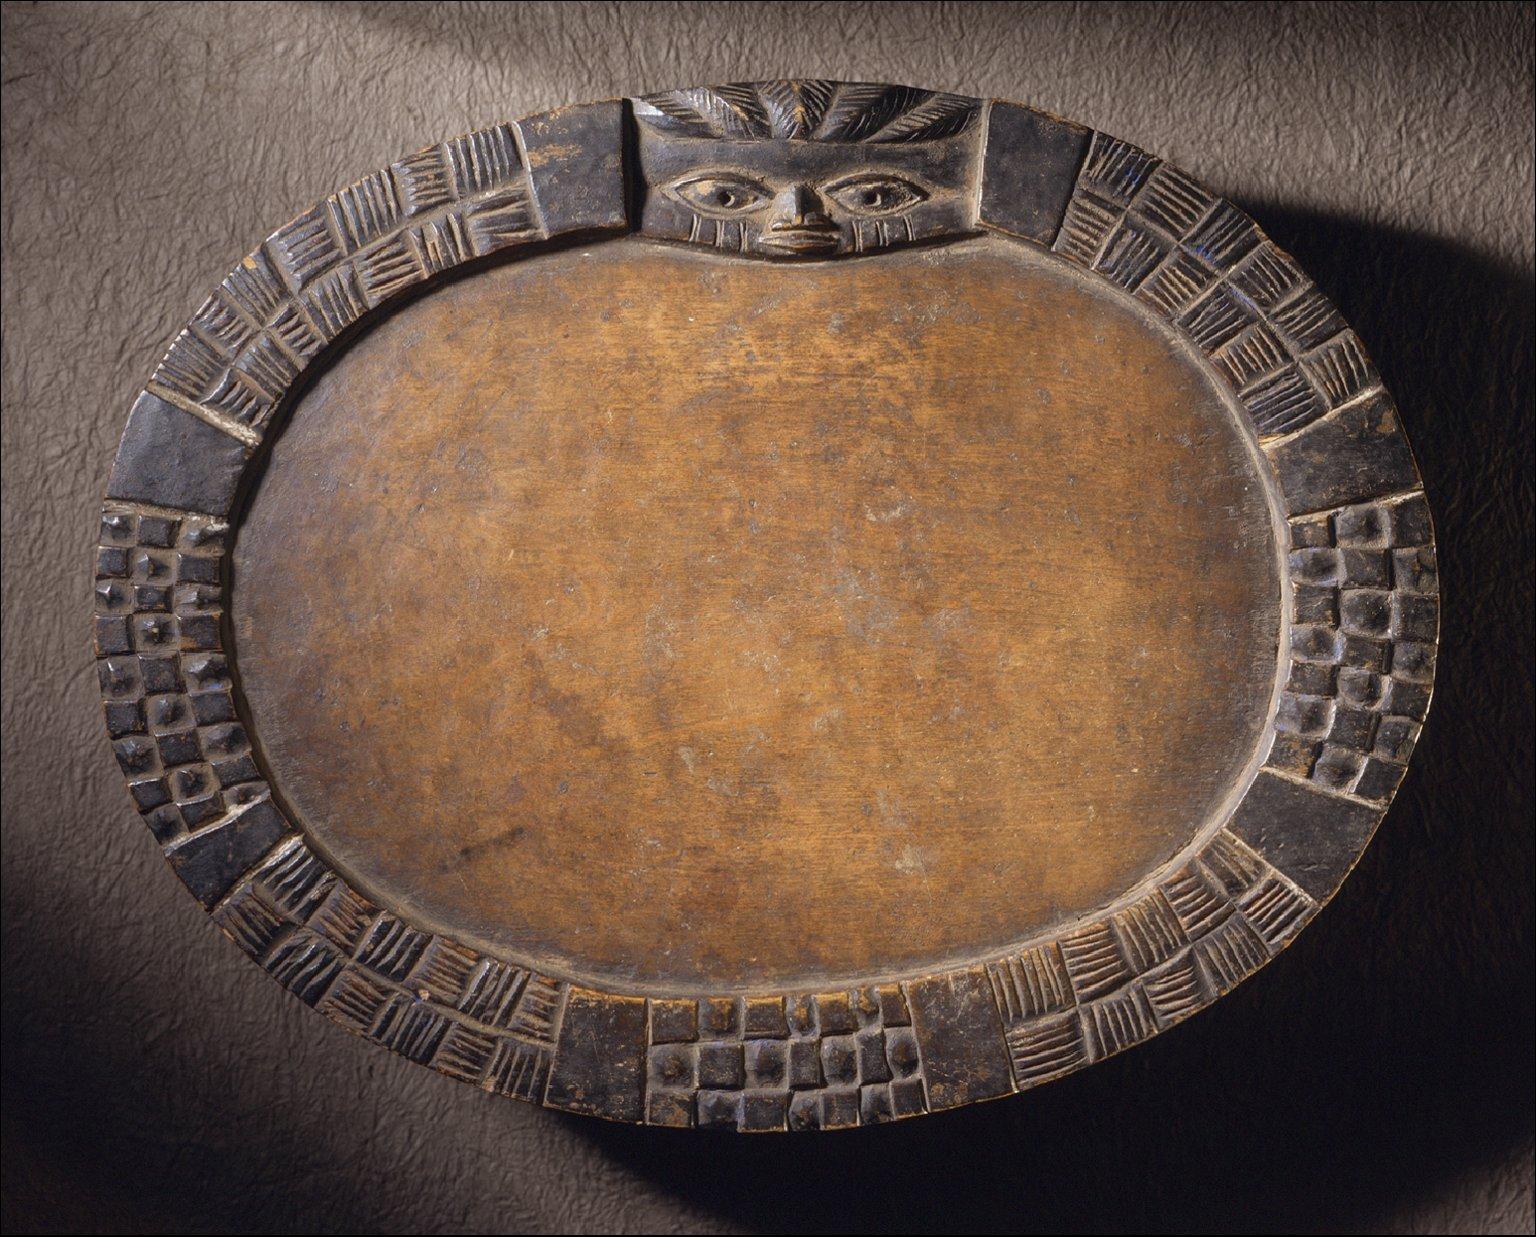 Ifa Divination Tray